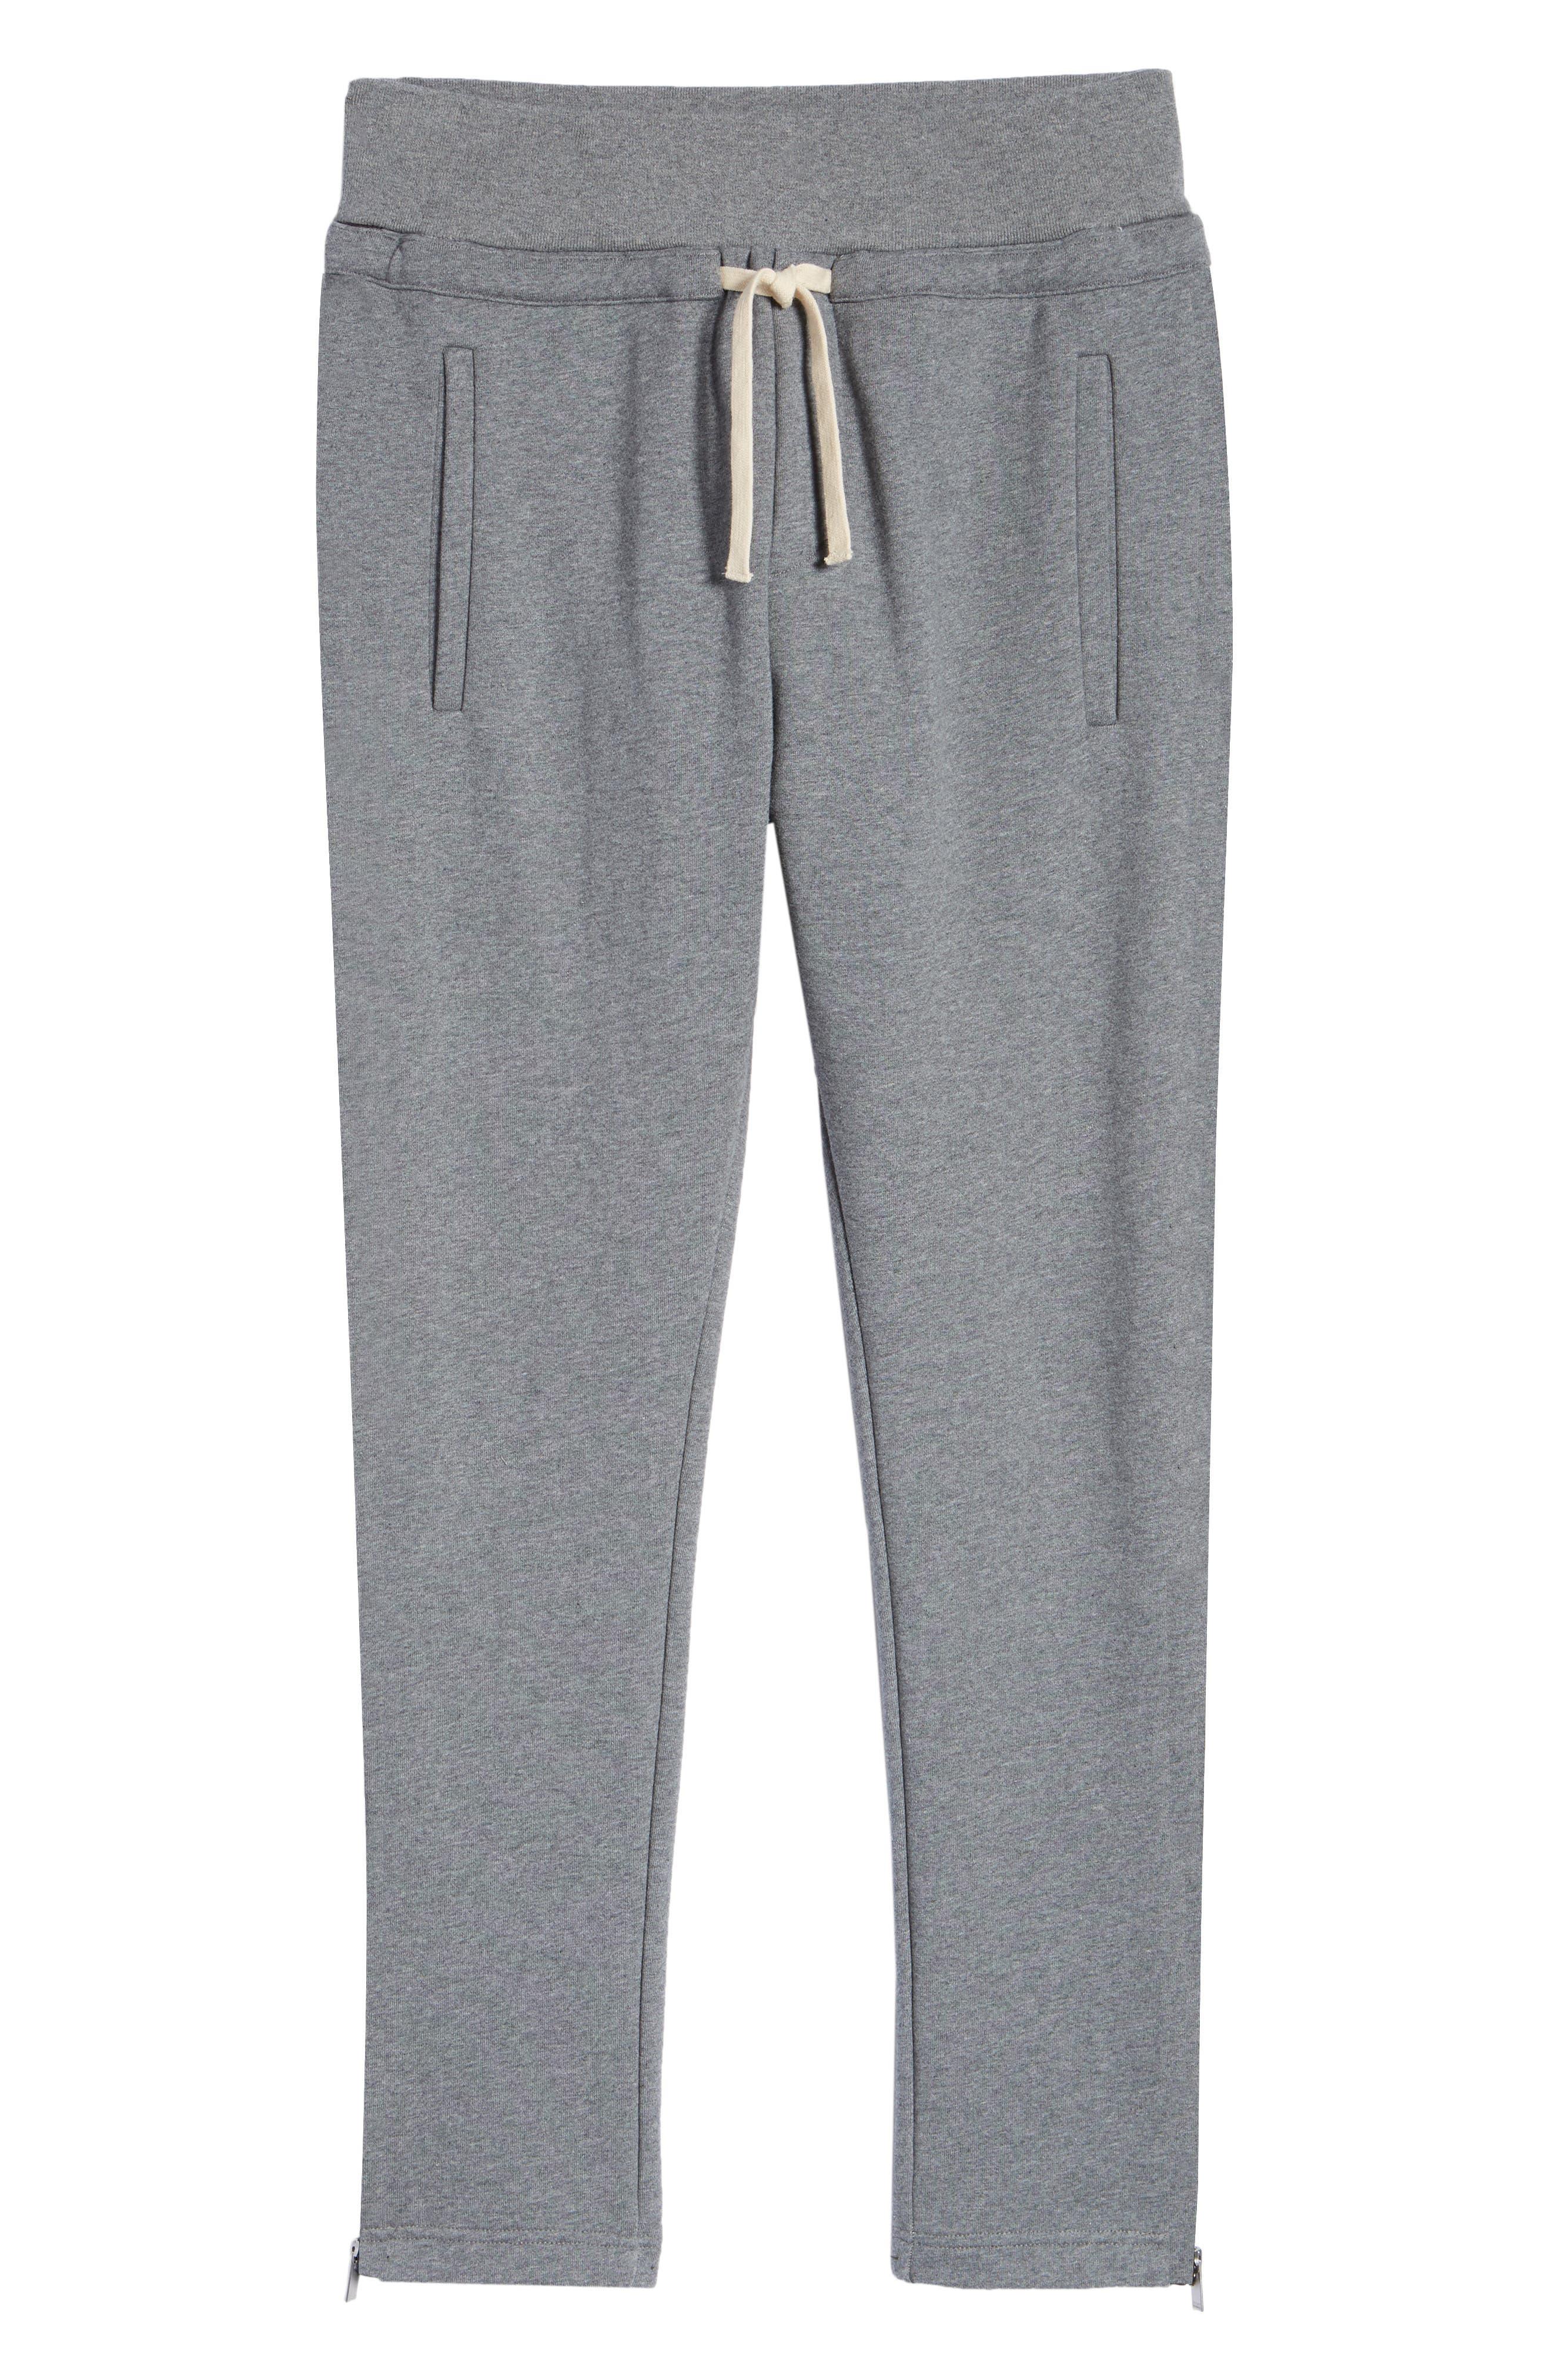 Slim Fit Jogger Pants,                             Alternate thumbnail 6, color,                             GREY